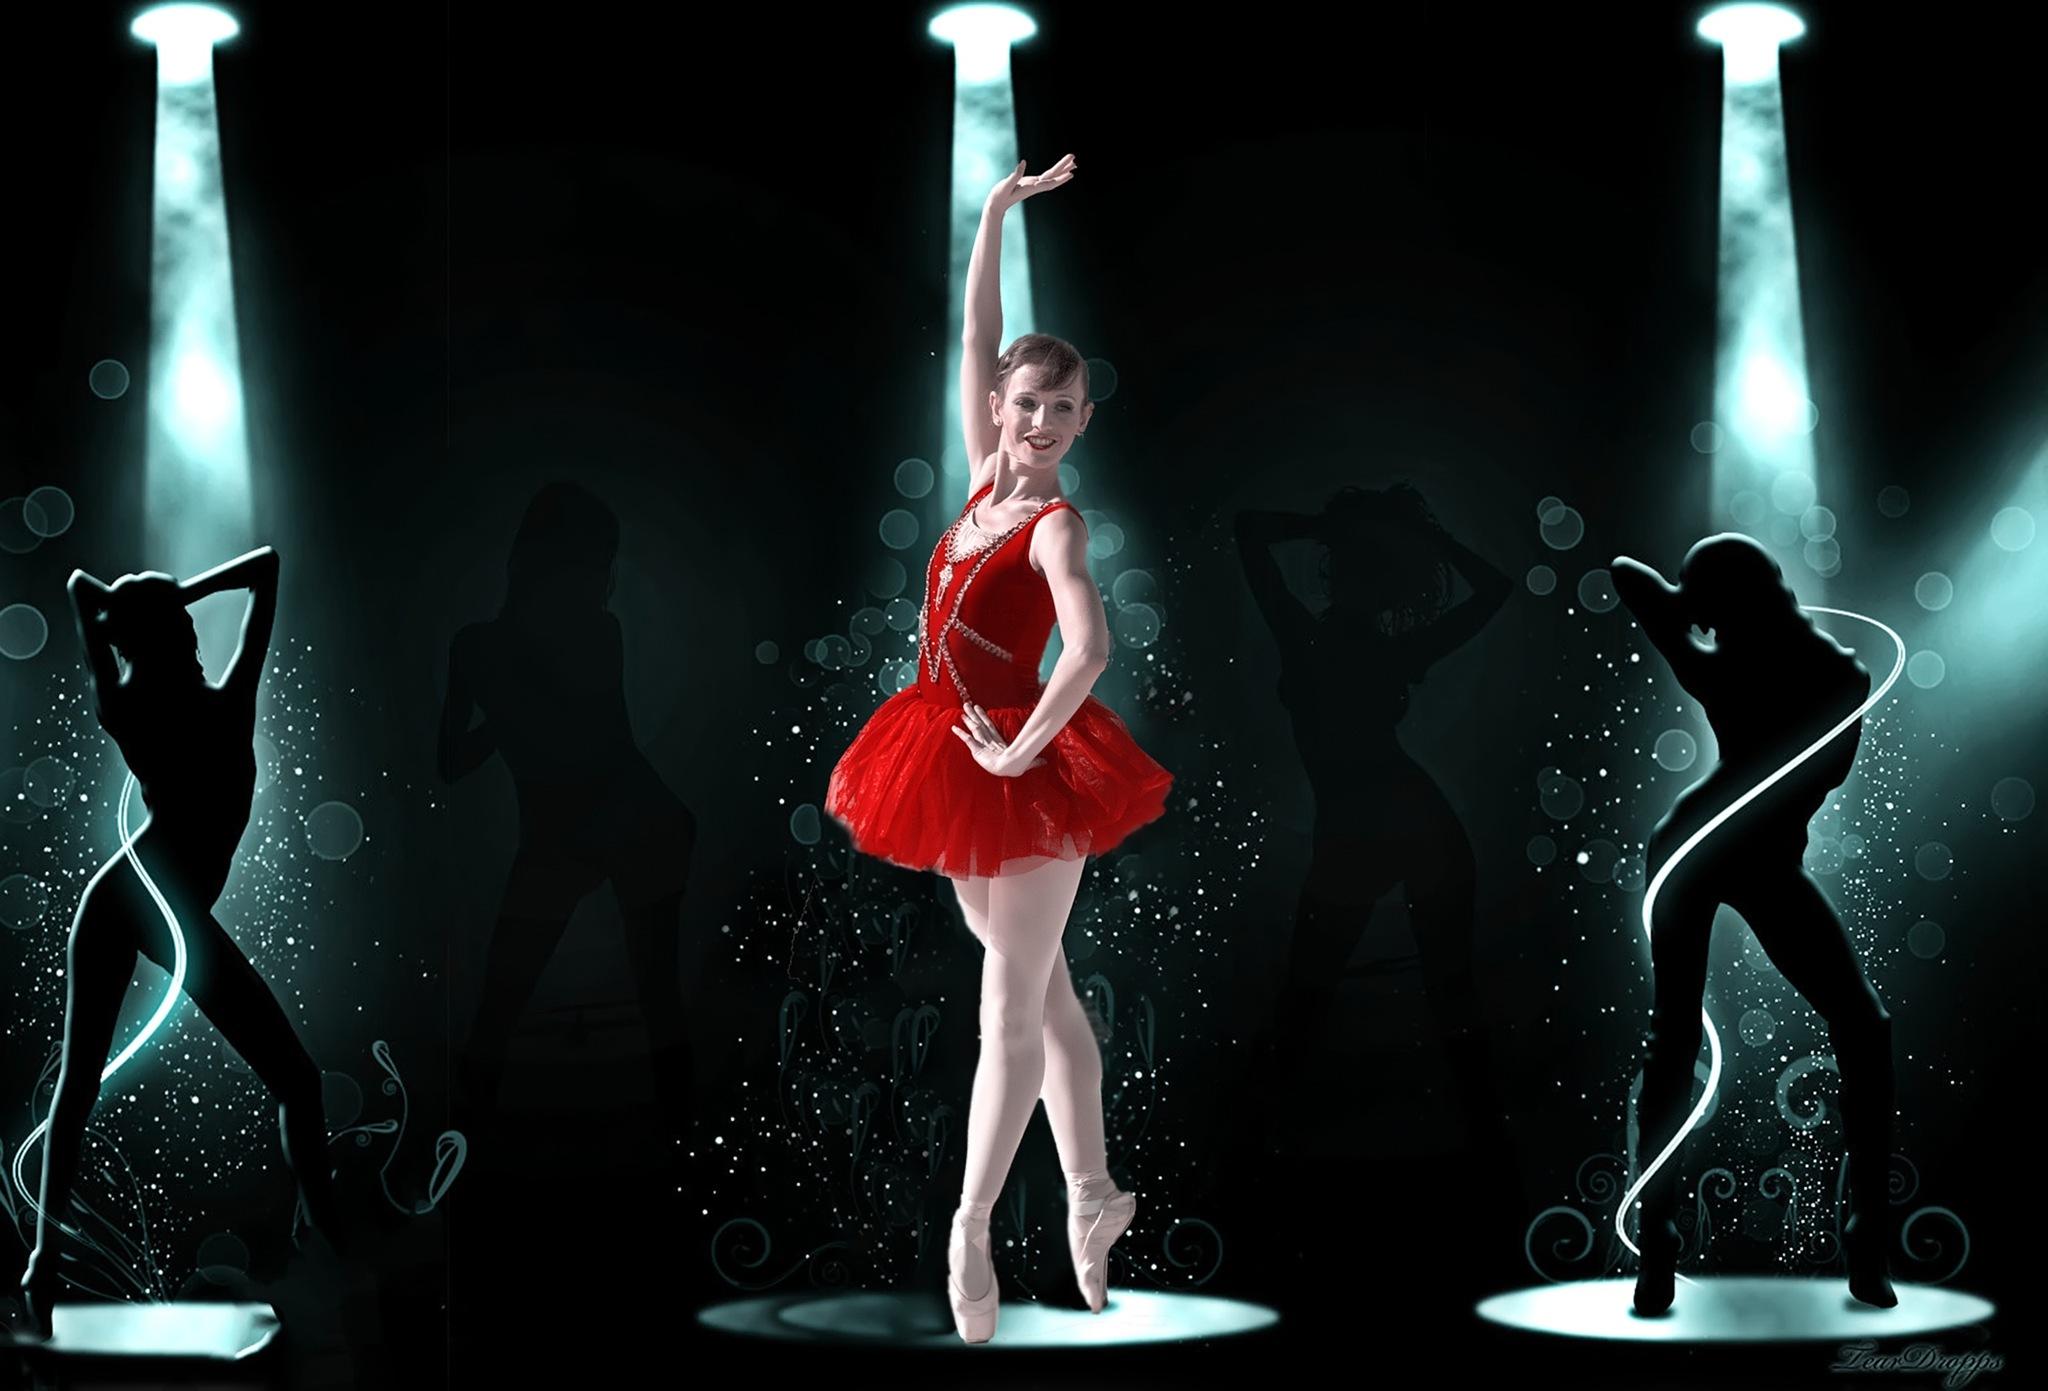 Keren on stage by Rebecca Danieli